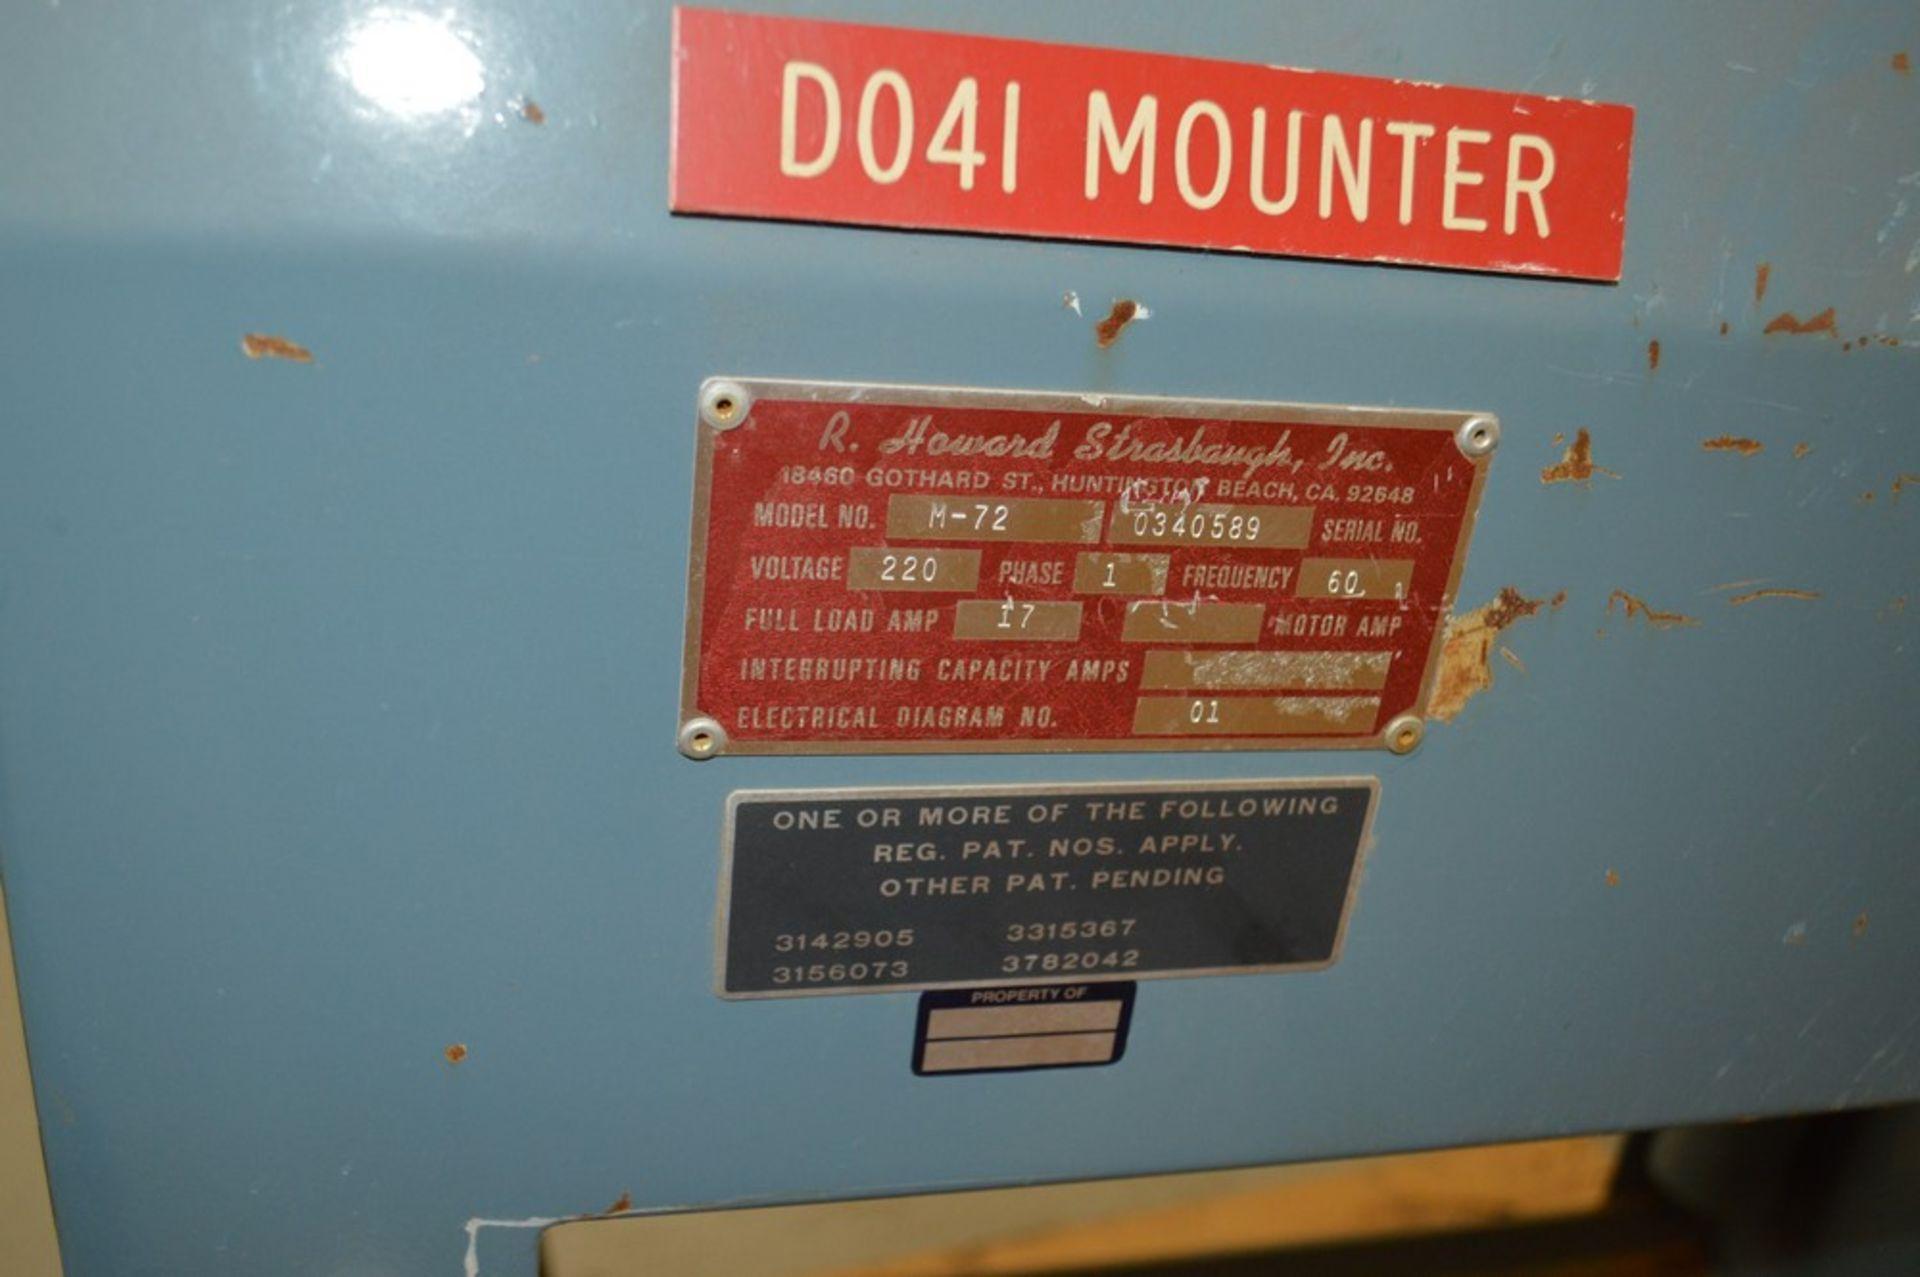 R Howard Strausbaugh, Model M-75, peunmatic press on skid. Mounting press - Image 5 of 6